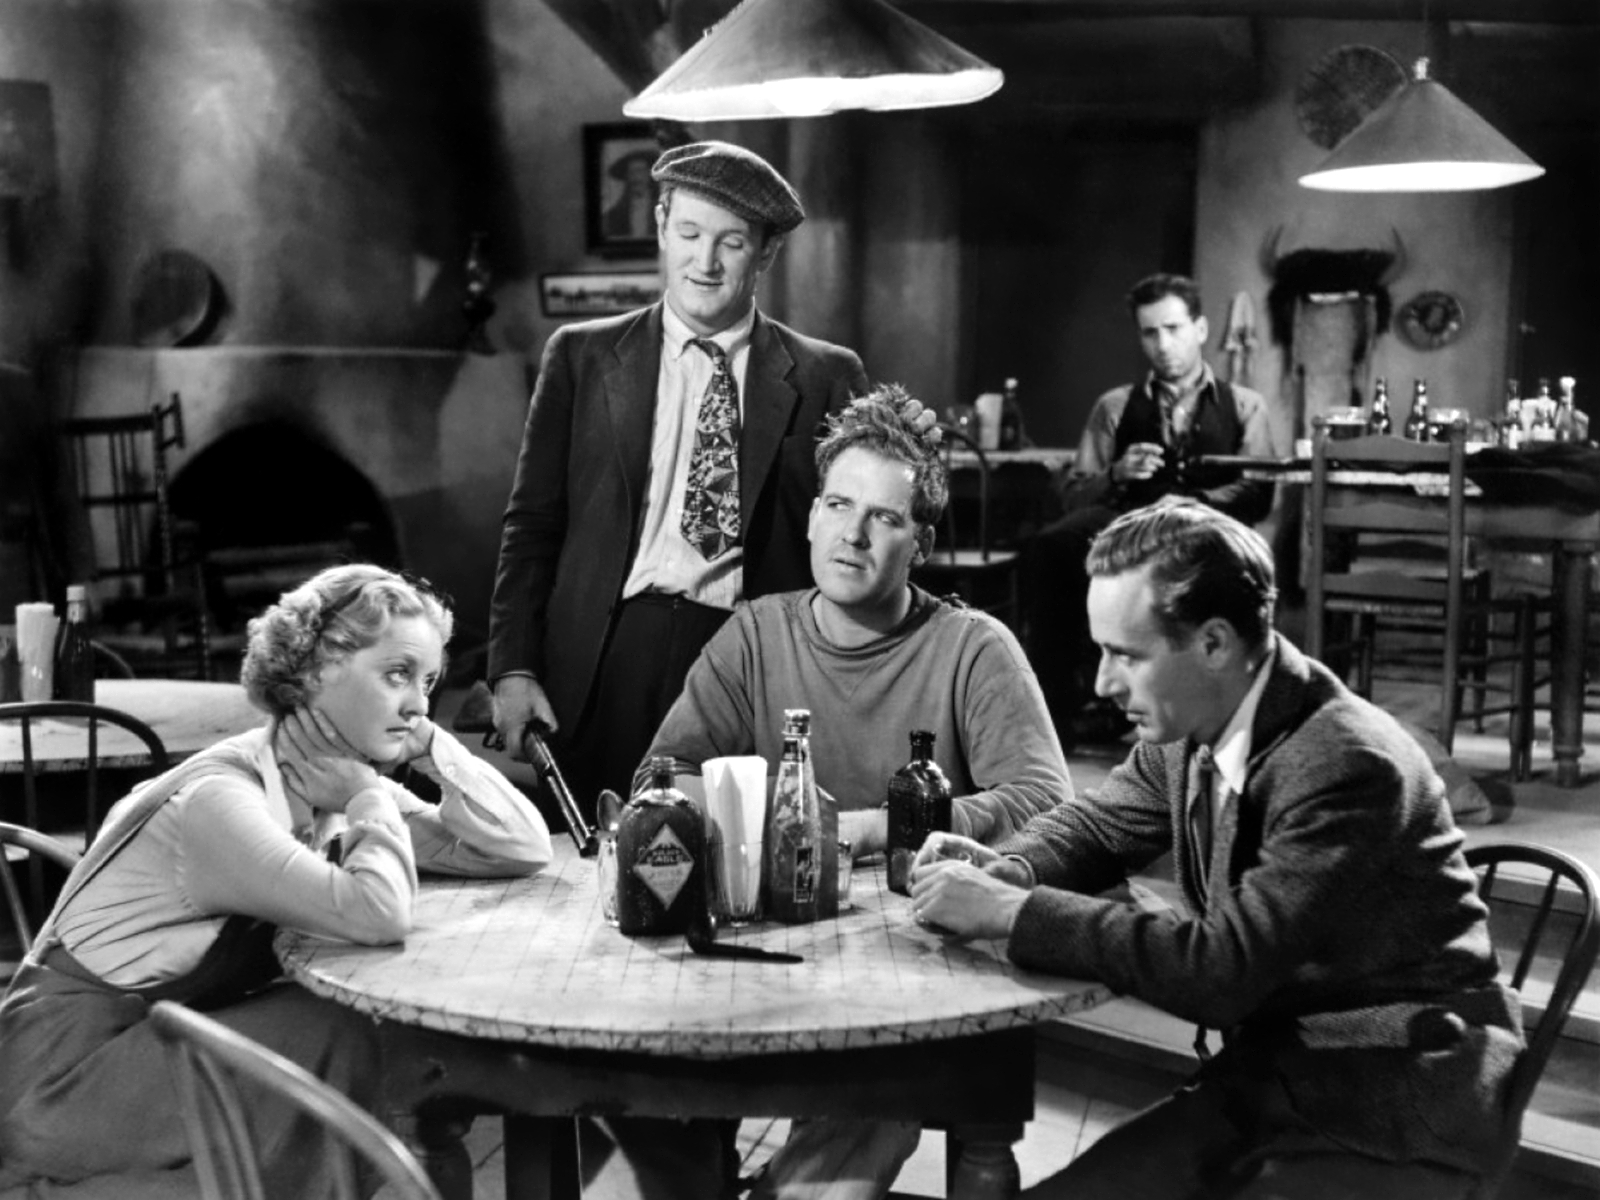 Leslie Howard in The Petrified Forest (L to R) Bette Davis, Joe Sawyer, Dick Foran, Humphrey Bogart, Leslie Howard